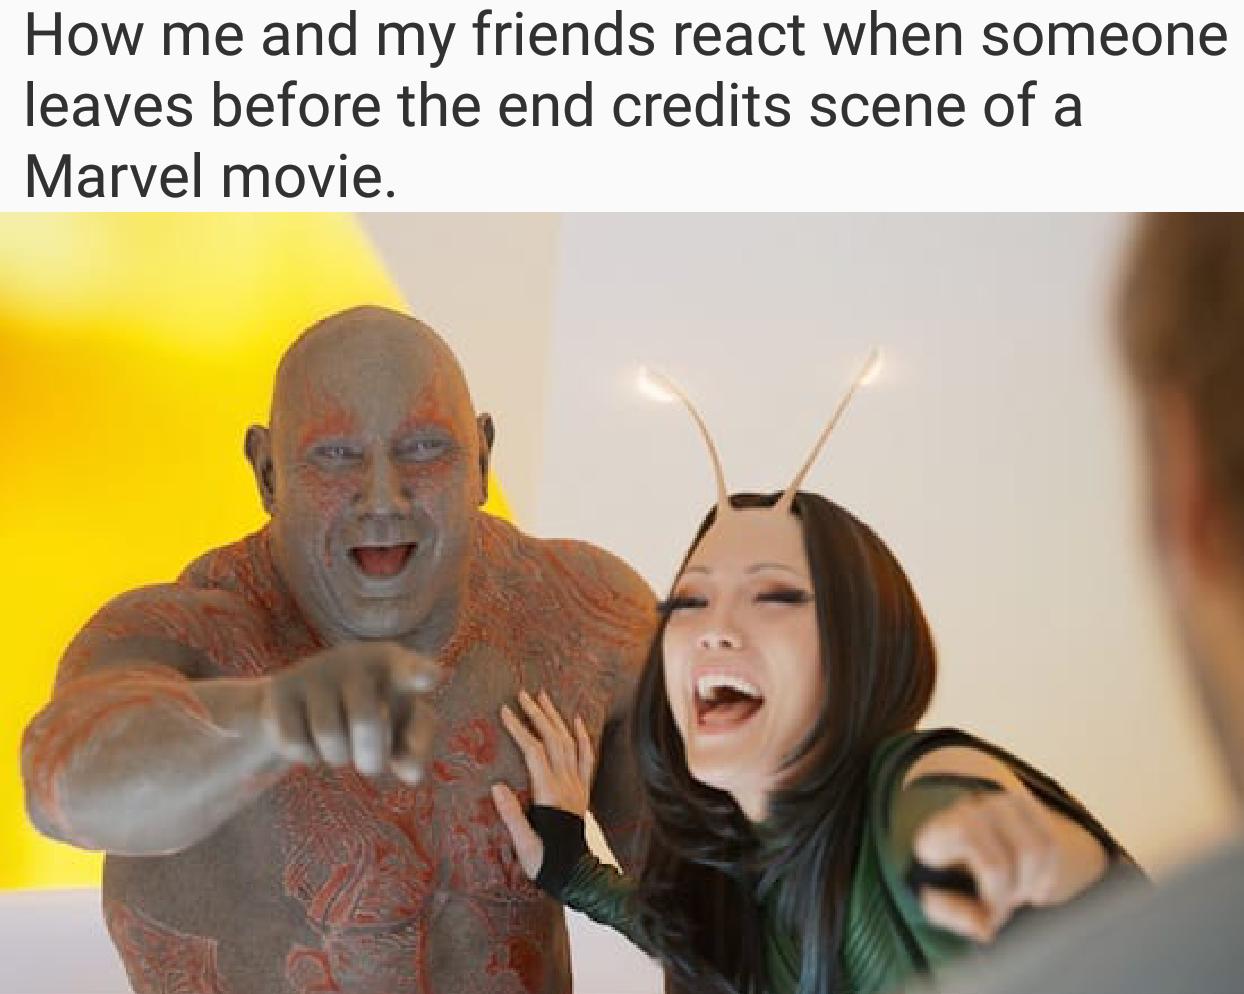 cheerful Drax memes